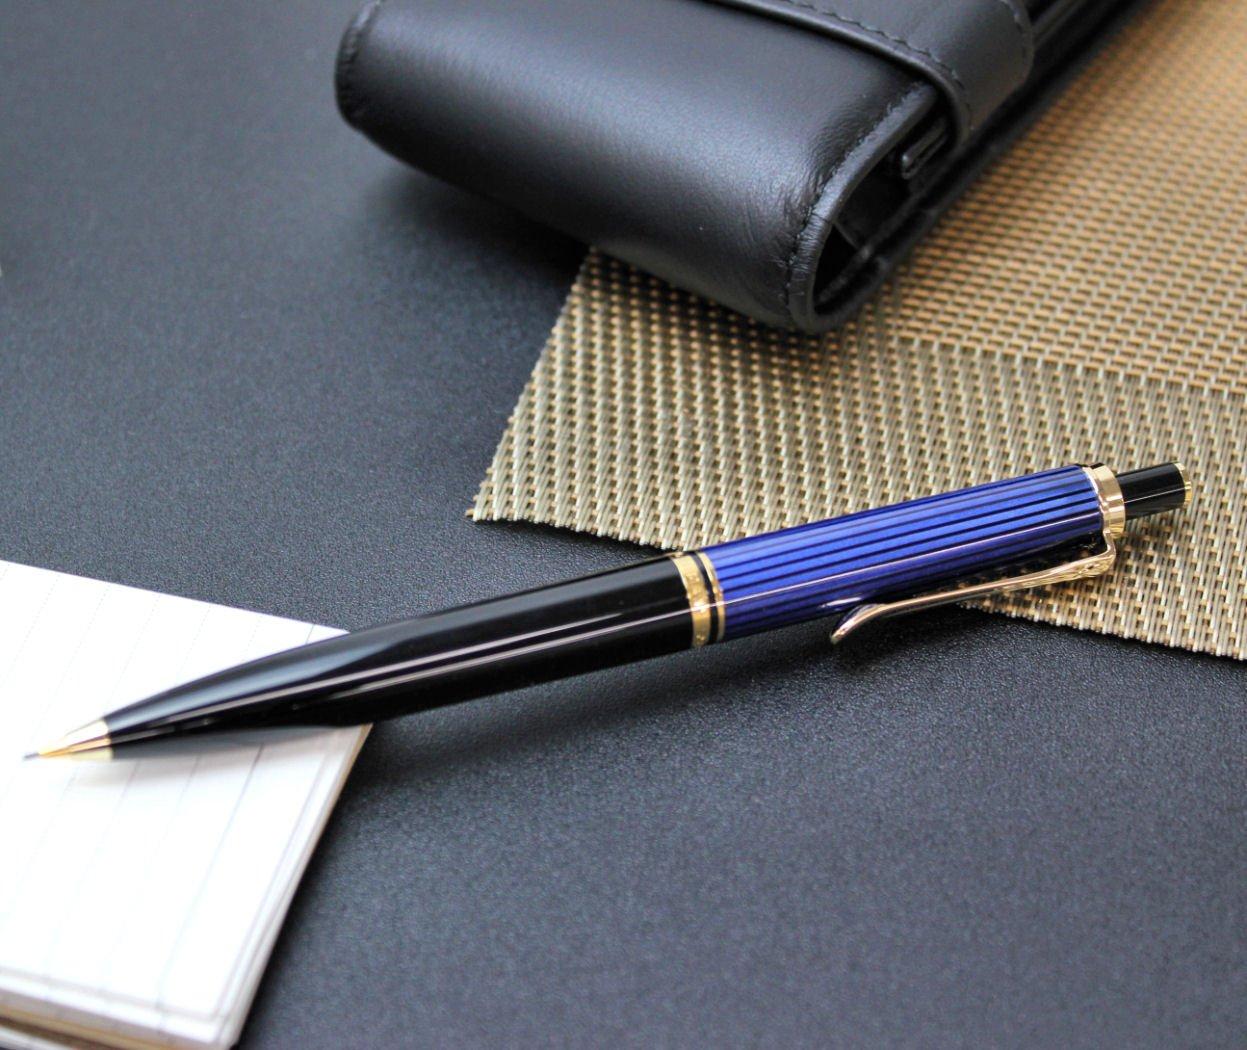 PELIKAN Souveran 400 Gt 7mm Pencil, Black/Blue (997171) by Pelikan (Image #4)